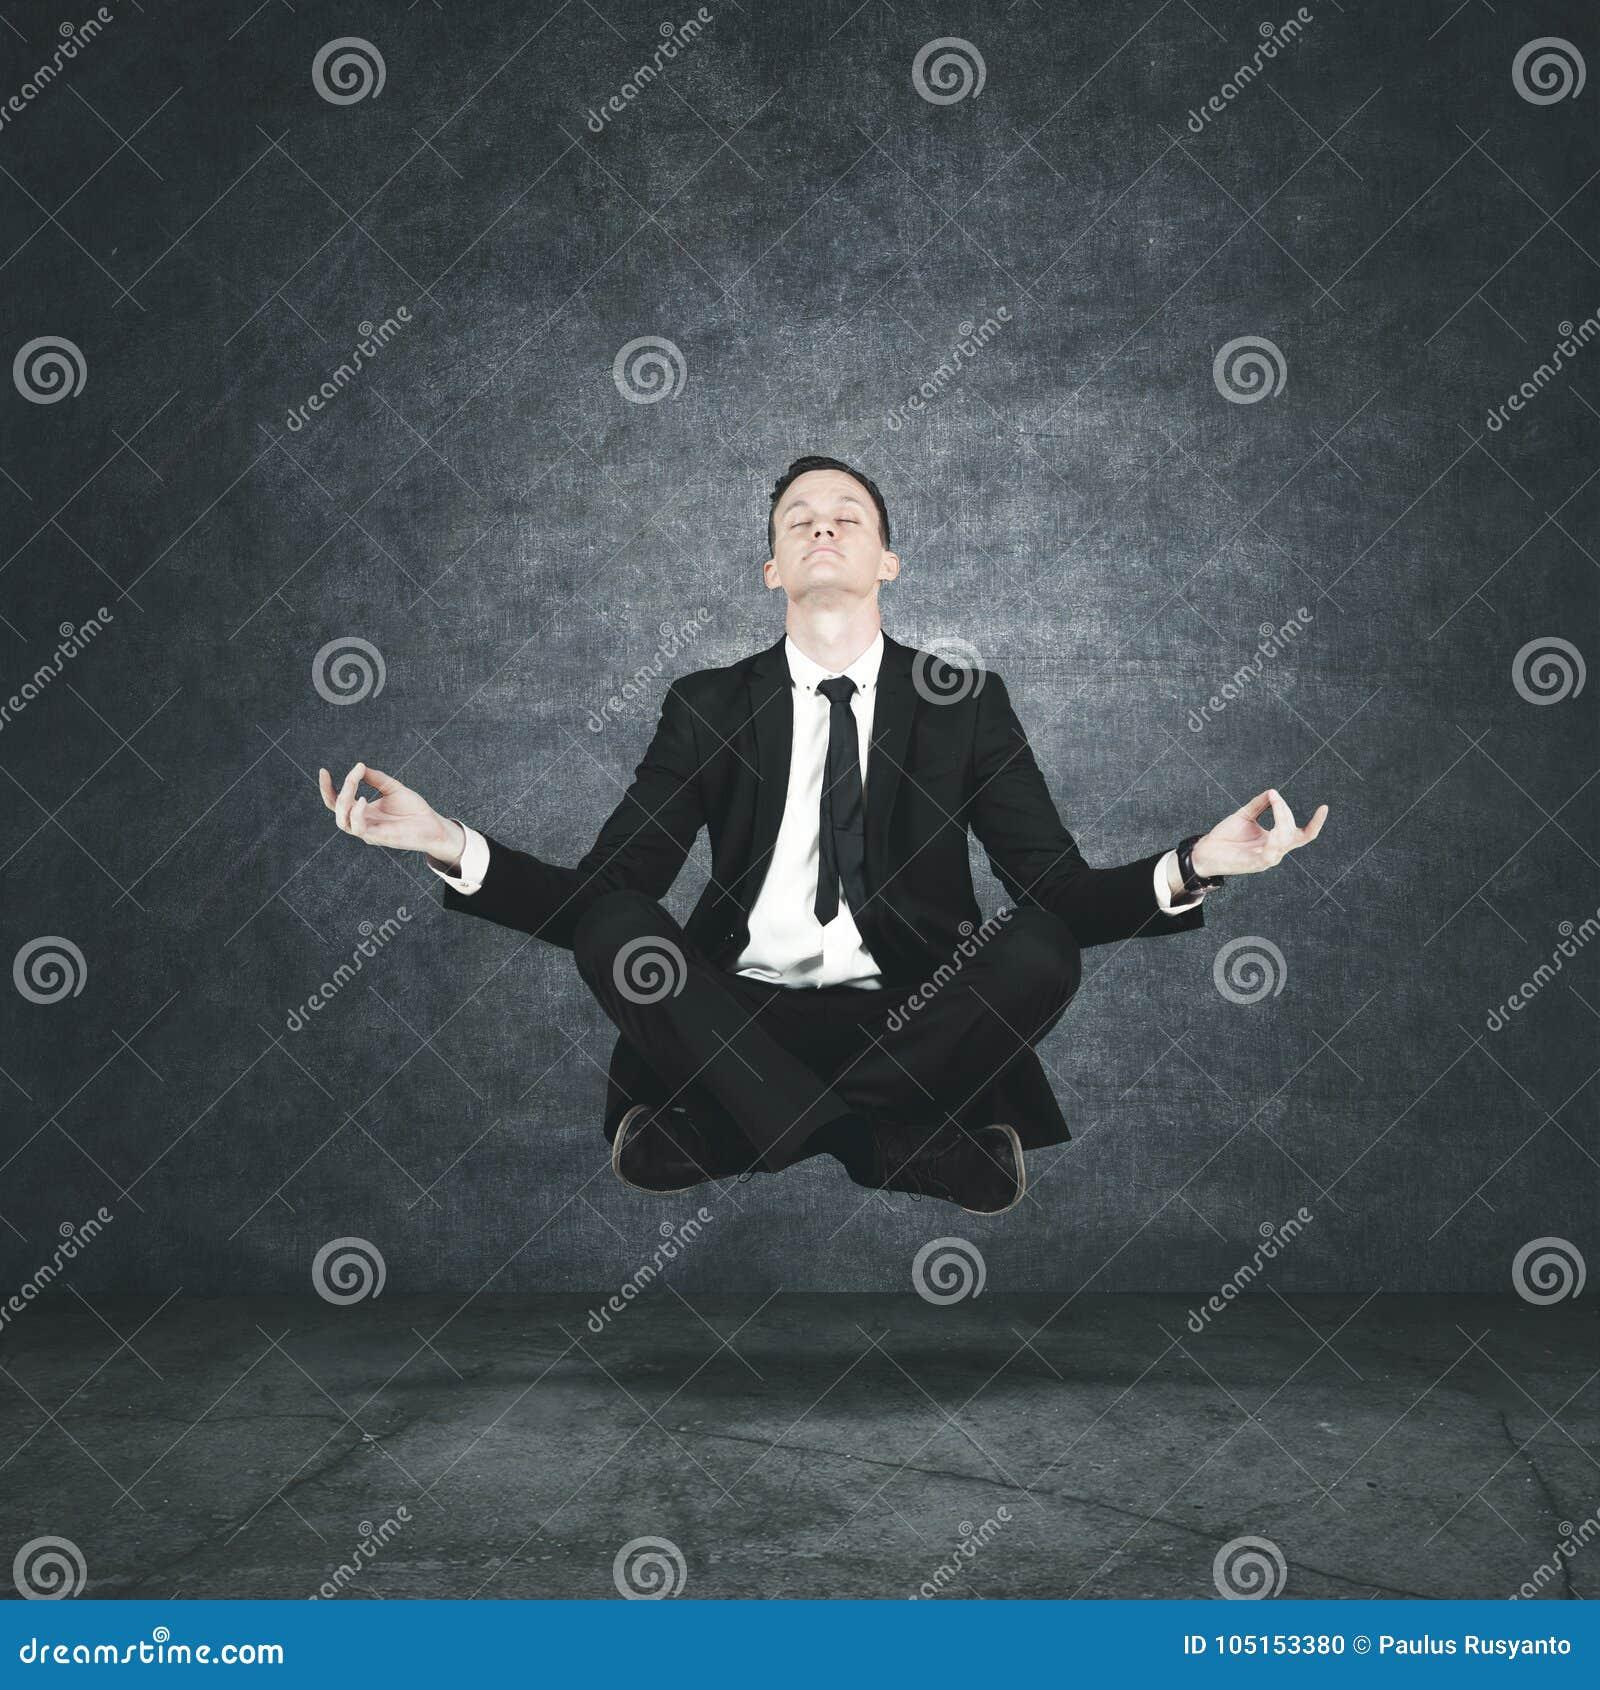 meditation businessman office. Calm Businessman Levitating During Meditation Office